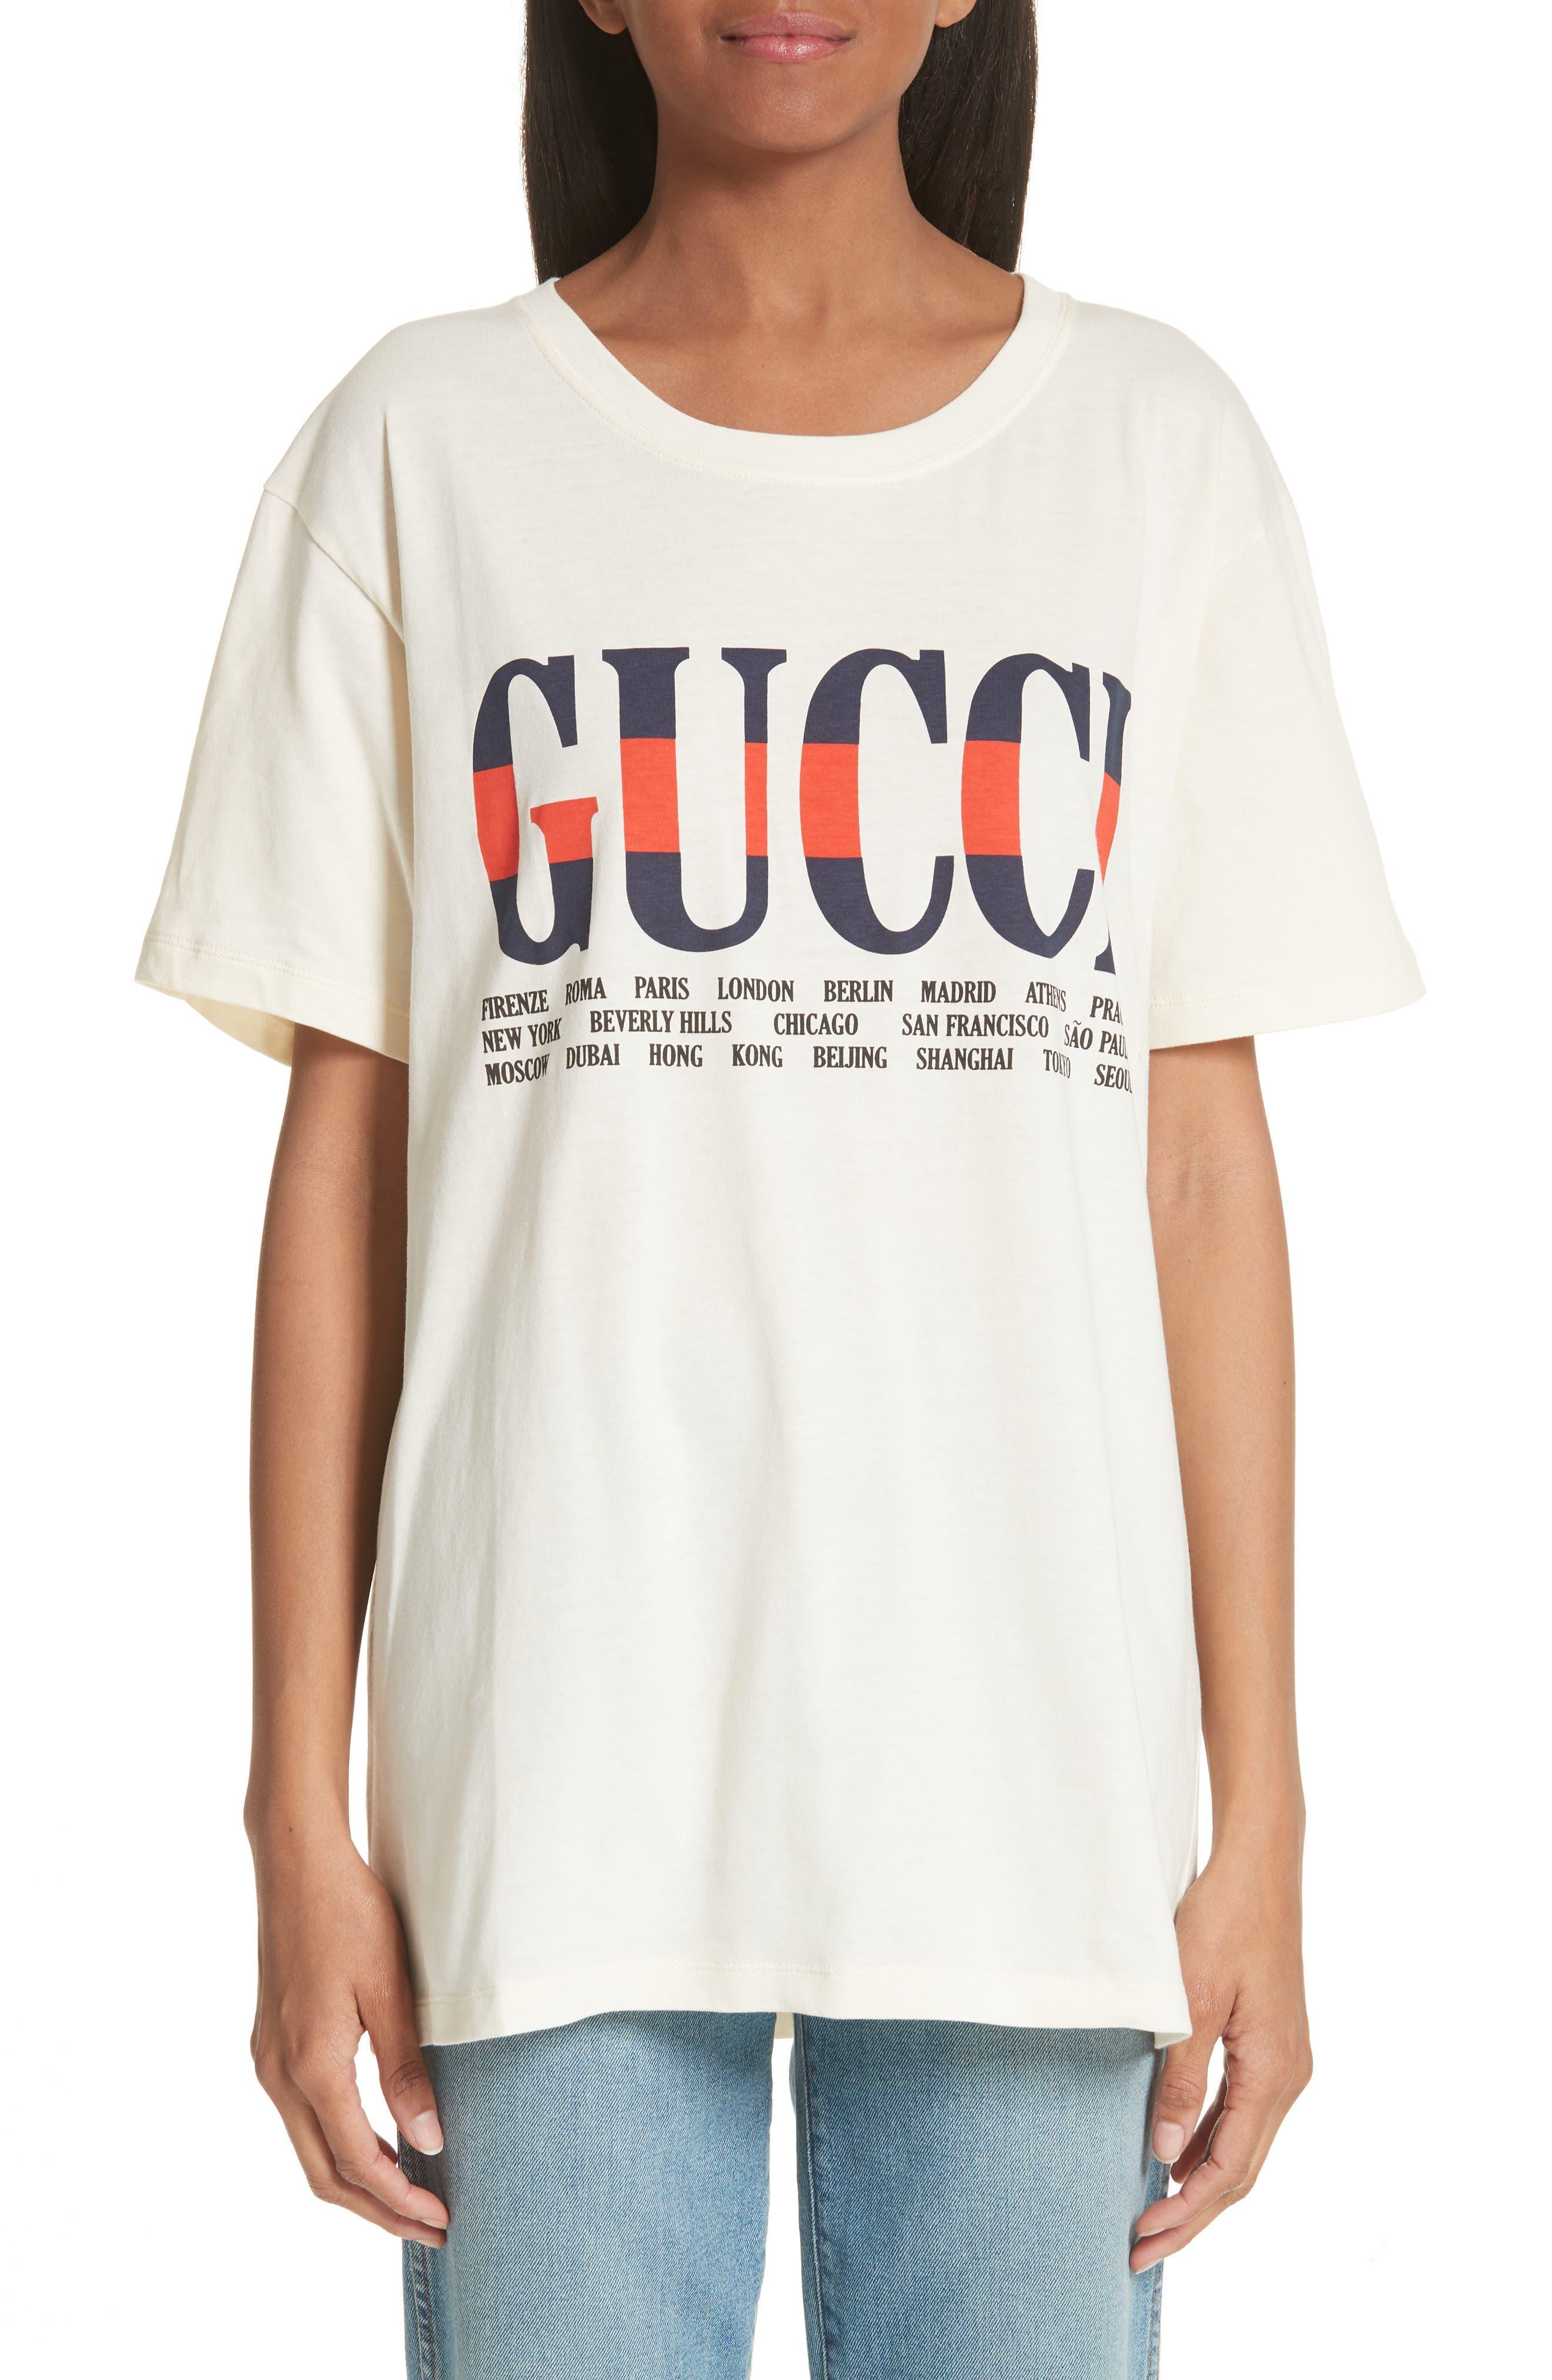 Gucci Cotton Graphic Tee